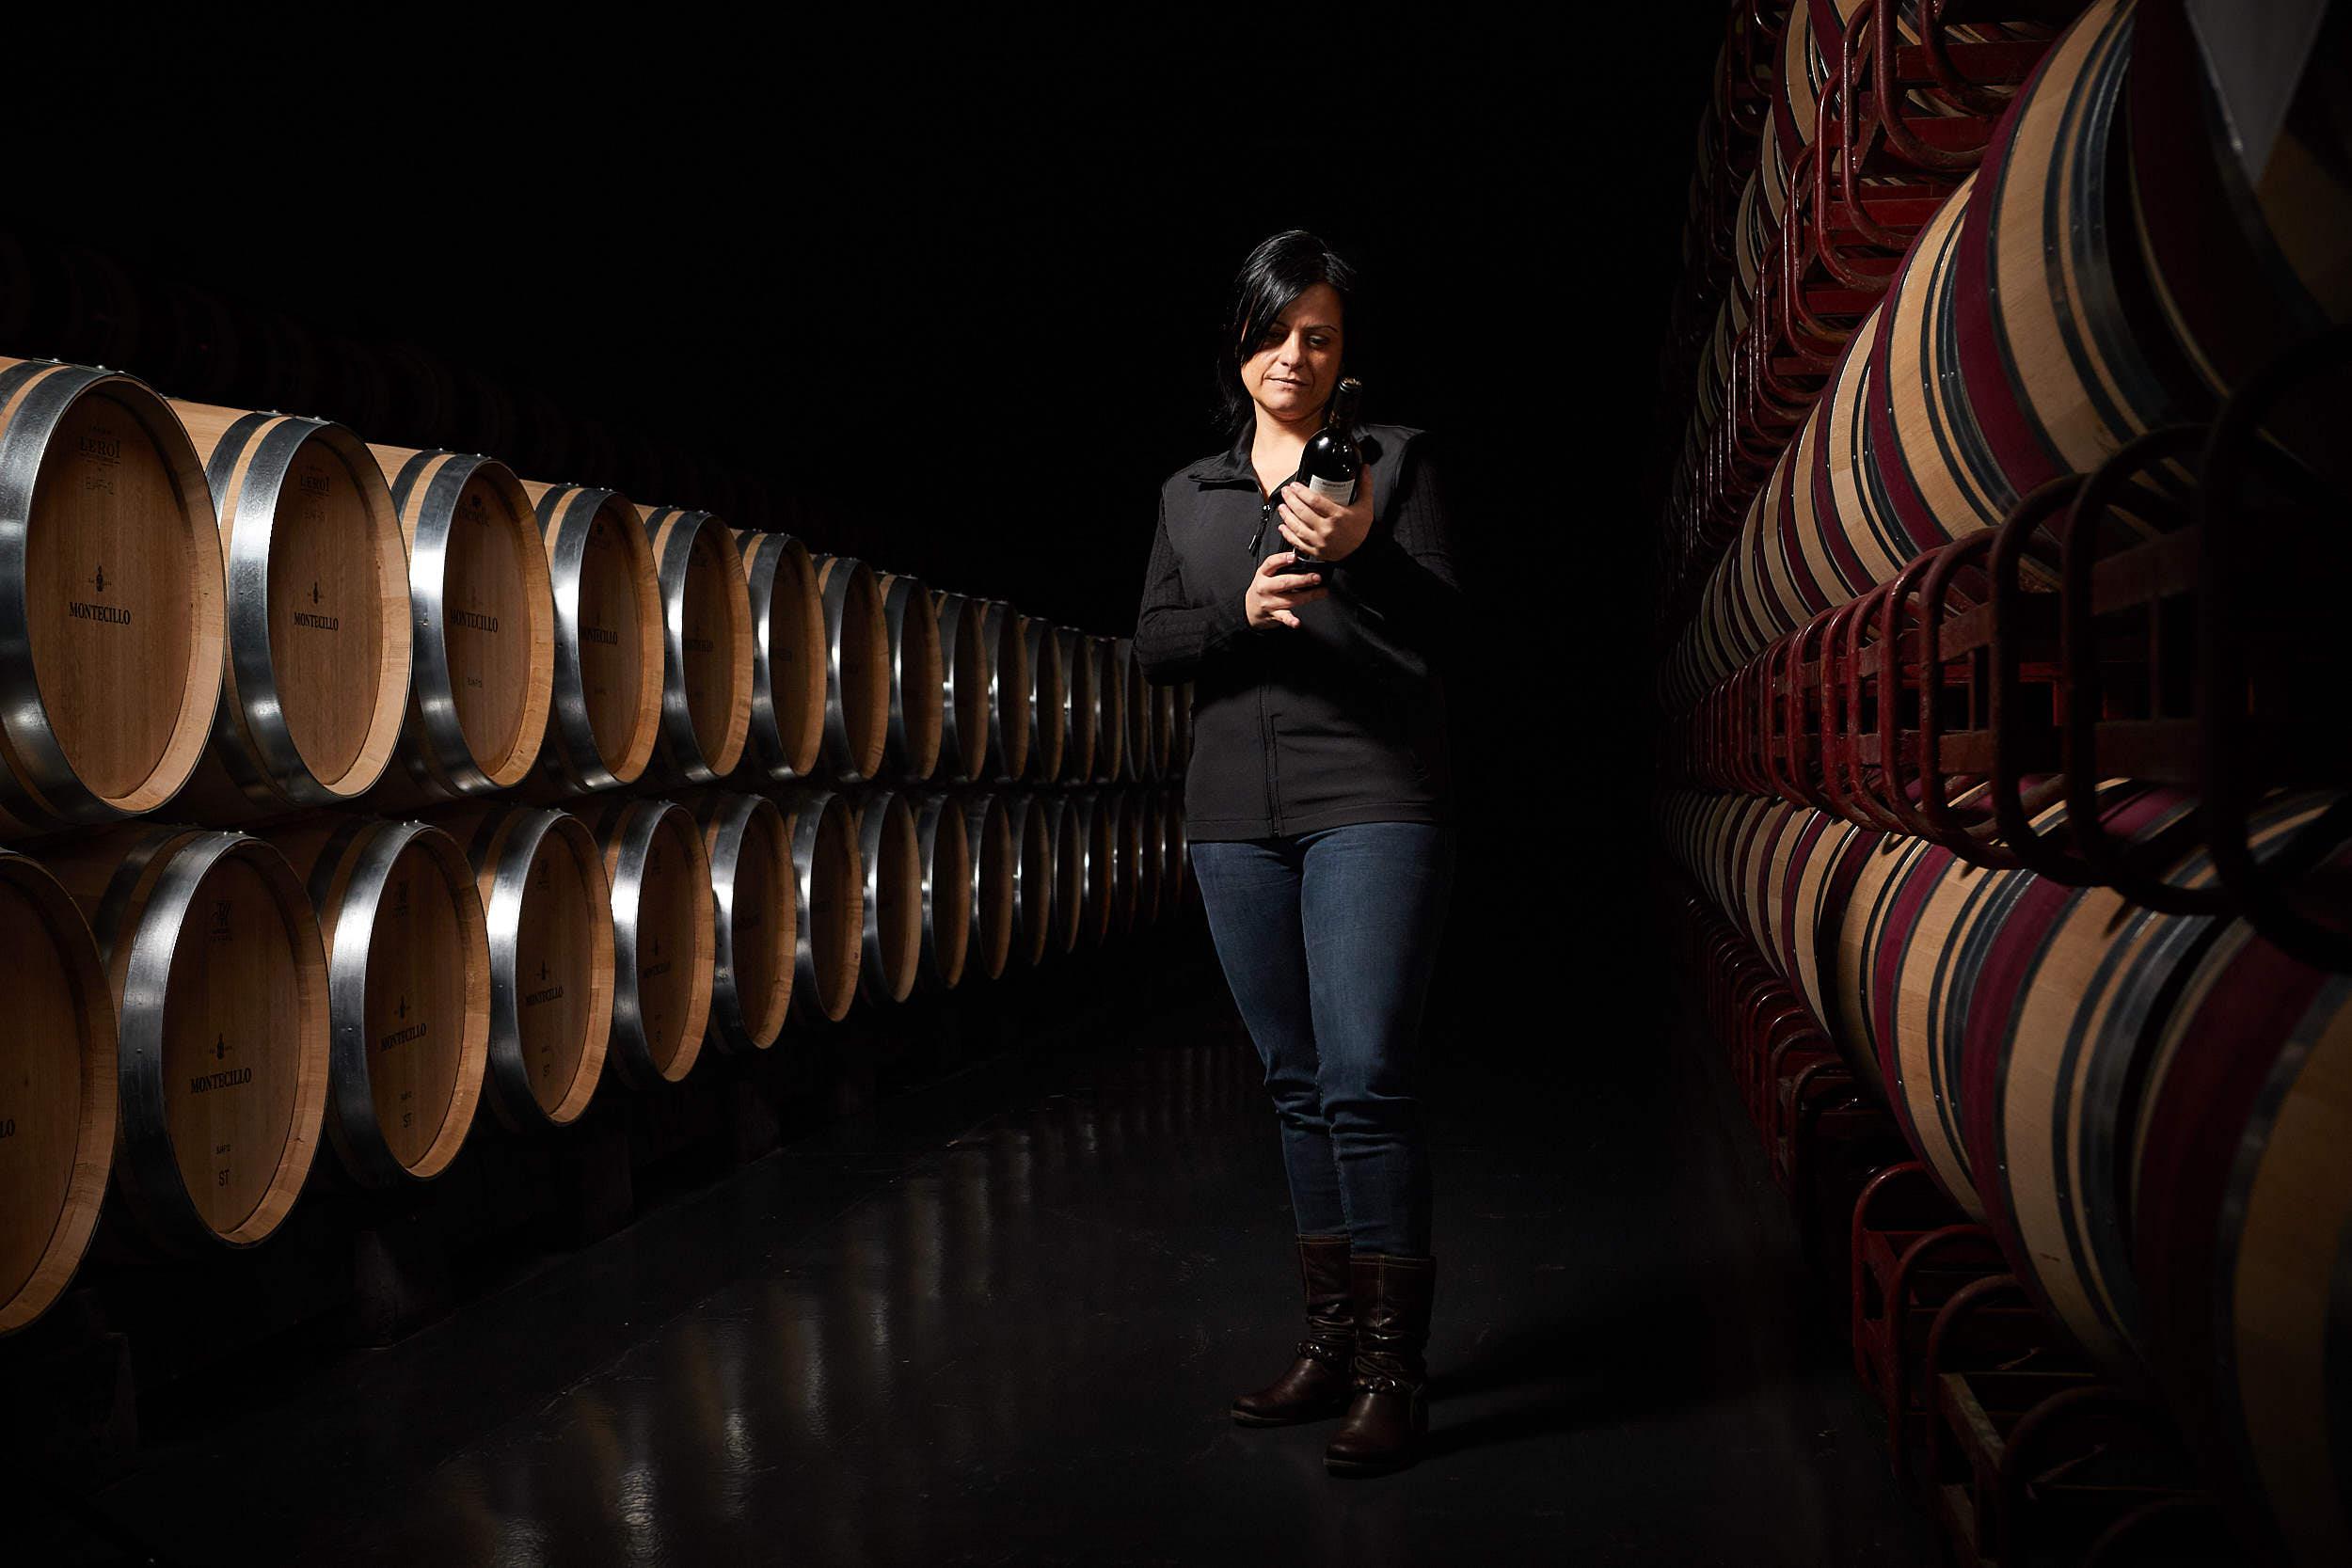 1612Bodegas_Montecillo_Wine_Photography_La_Rioja_Spain_James_Sturcke_sturcke.org_0012.jpg